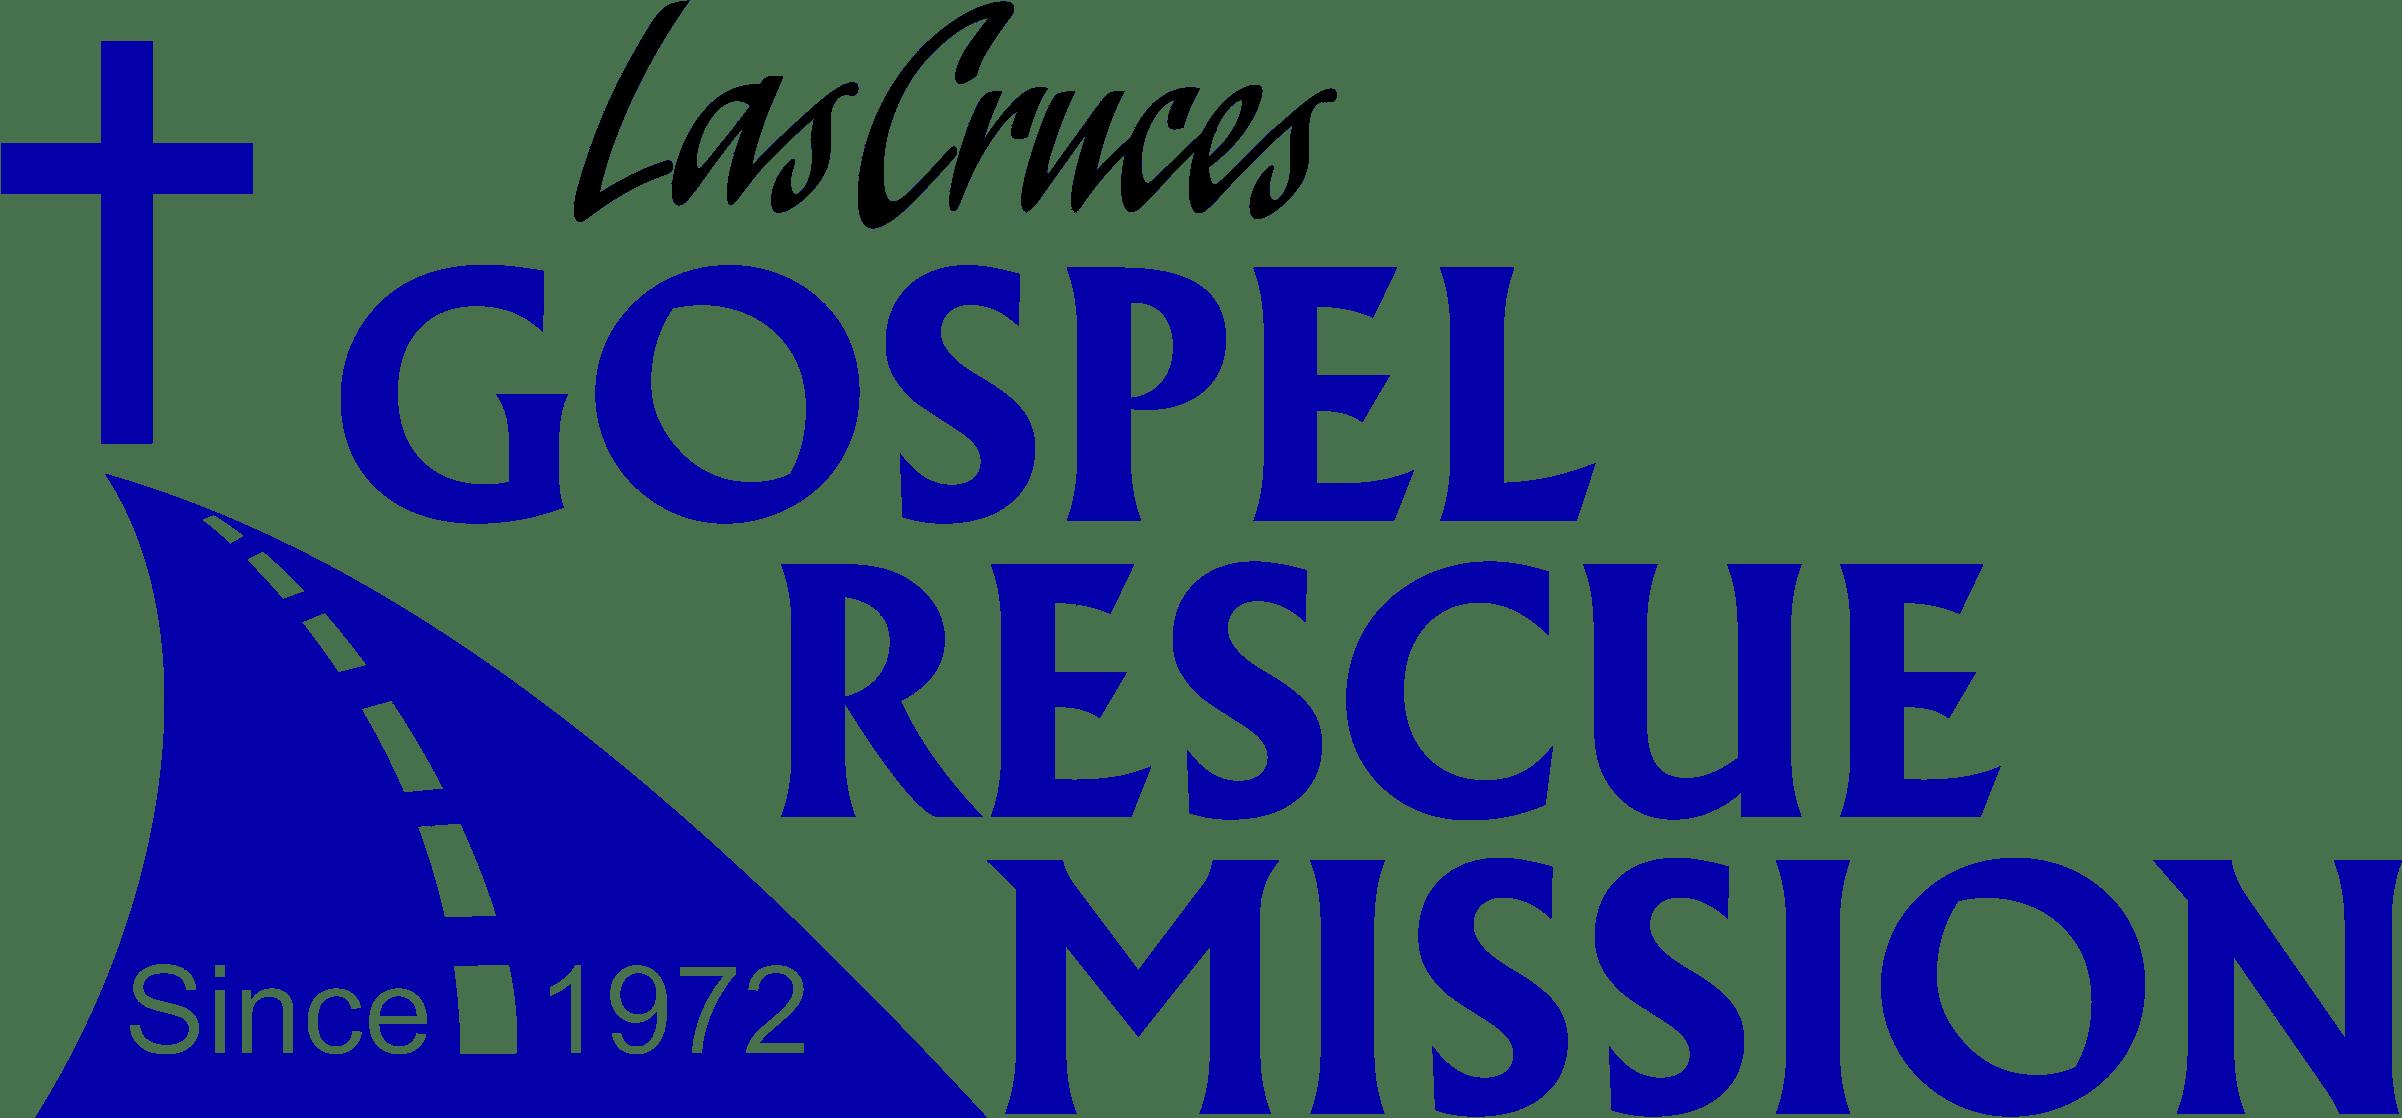 Las Cruces Gospel Rescue Mission